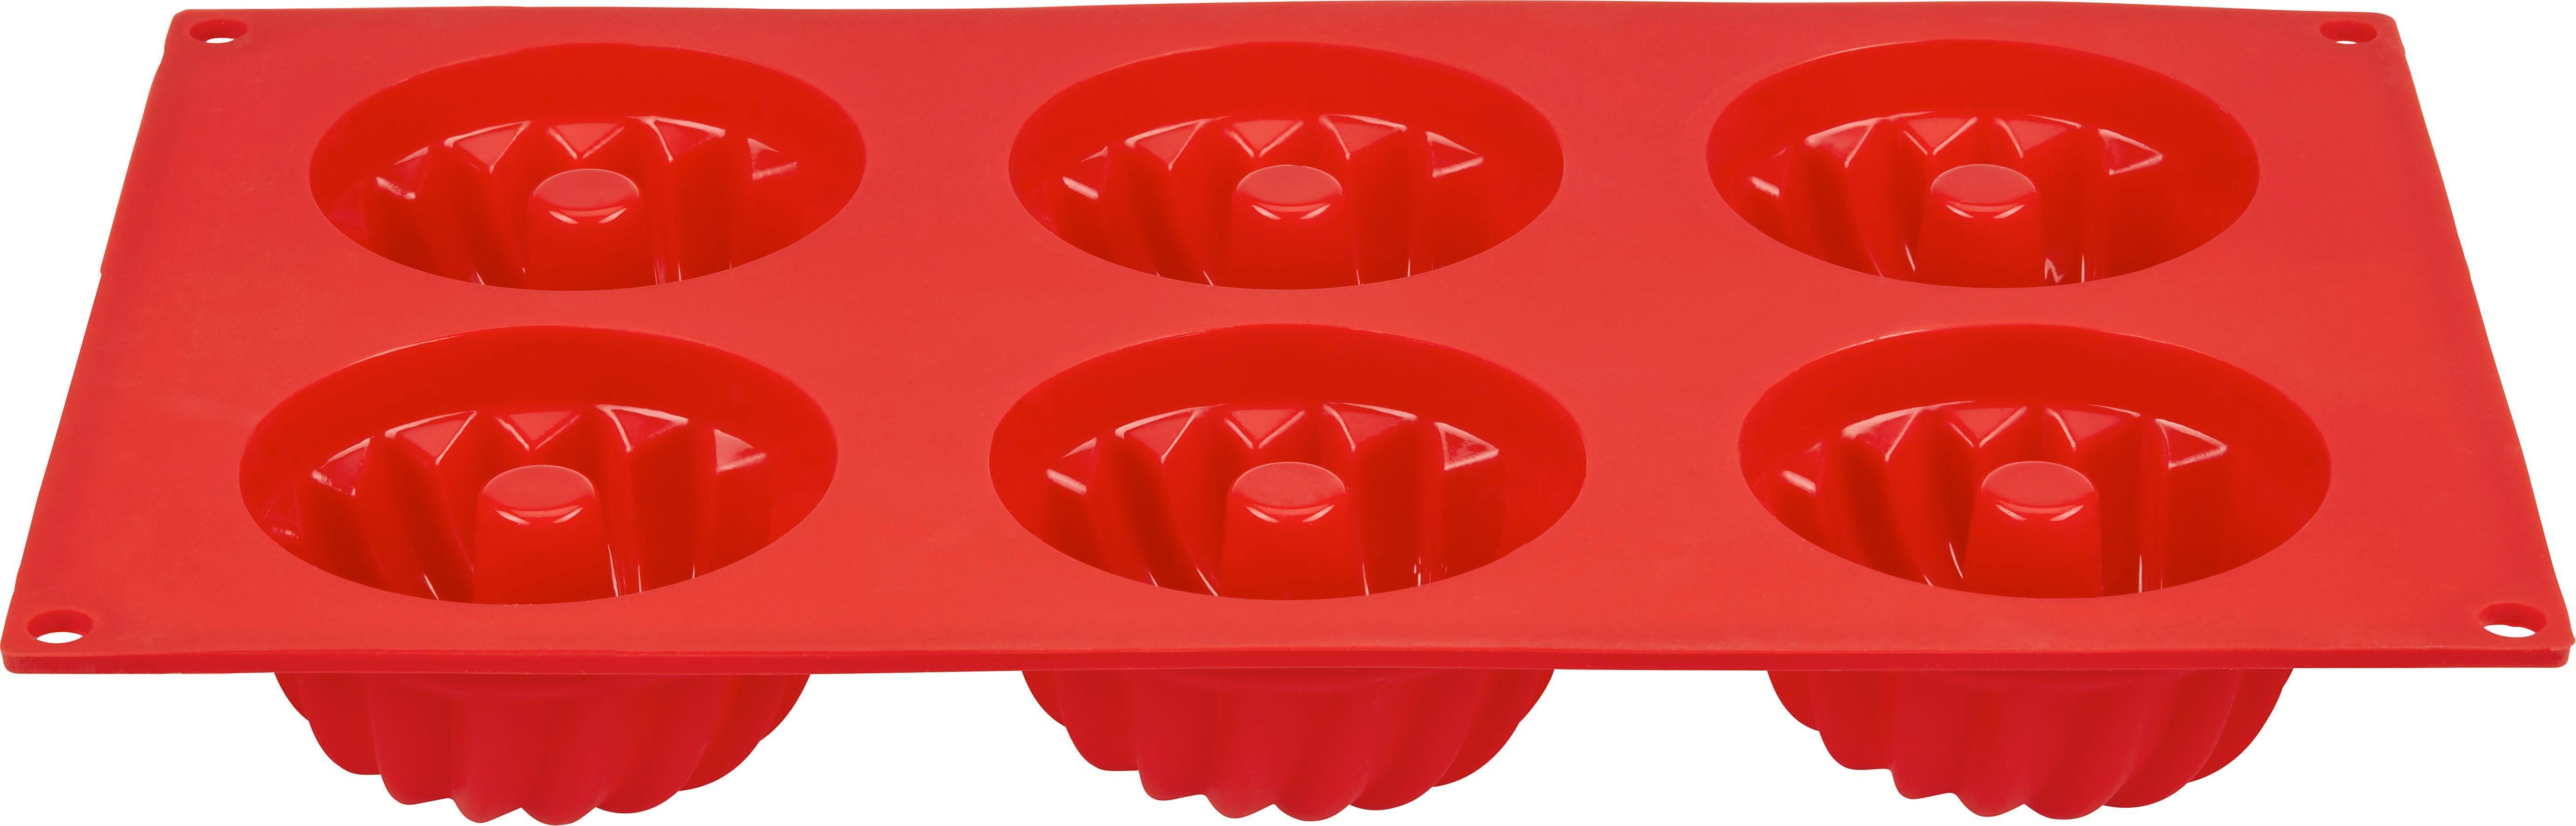 Muffinform Silke in Rot aus Silikon - Rot, Kunststoff (29,5/14/3,4cm) - MÖMAX modern living